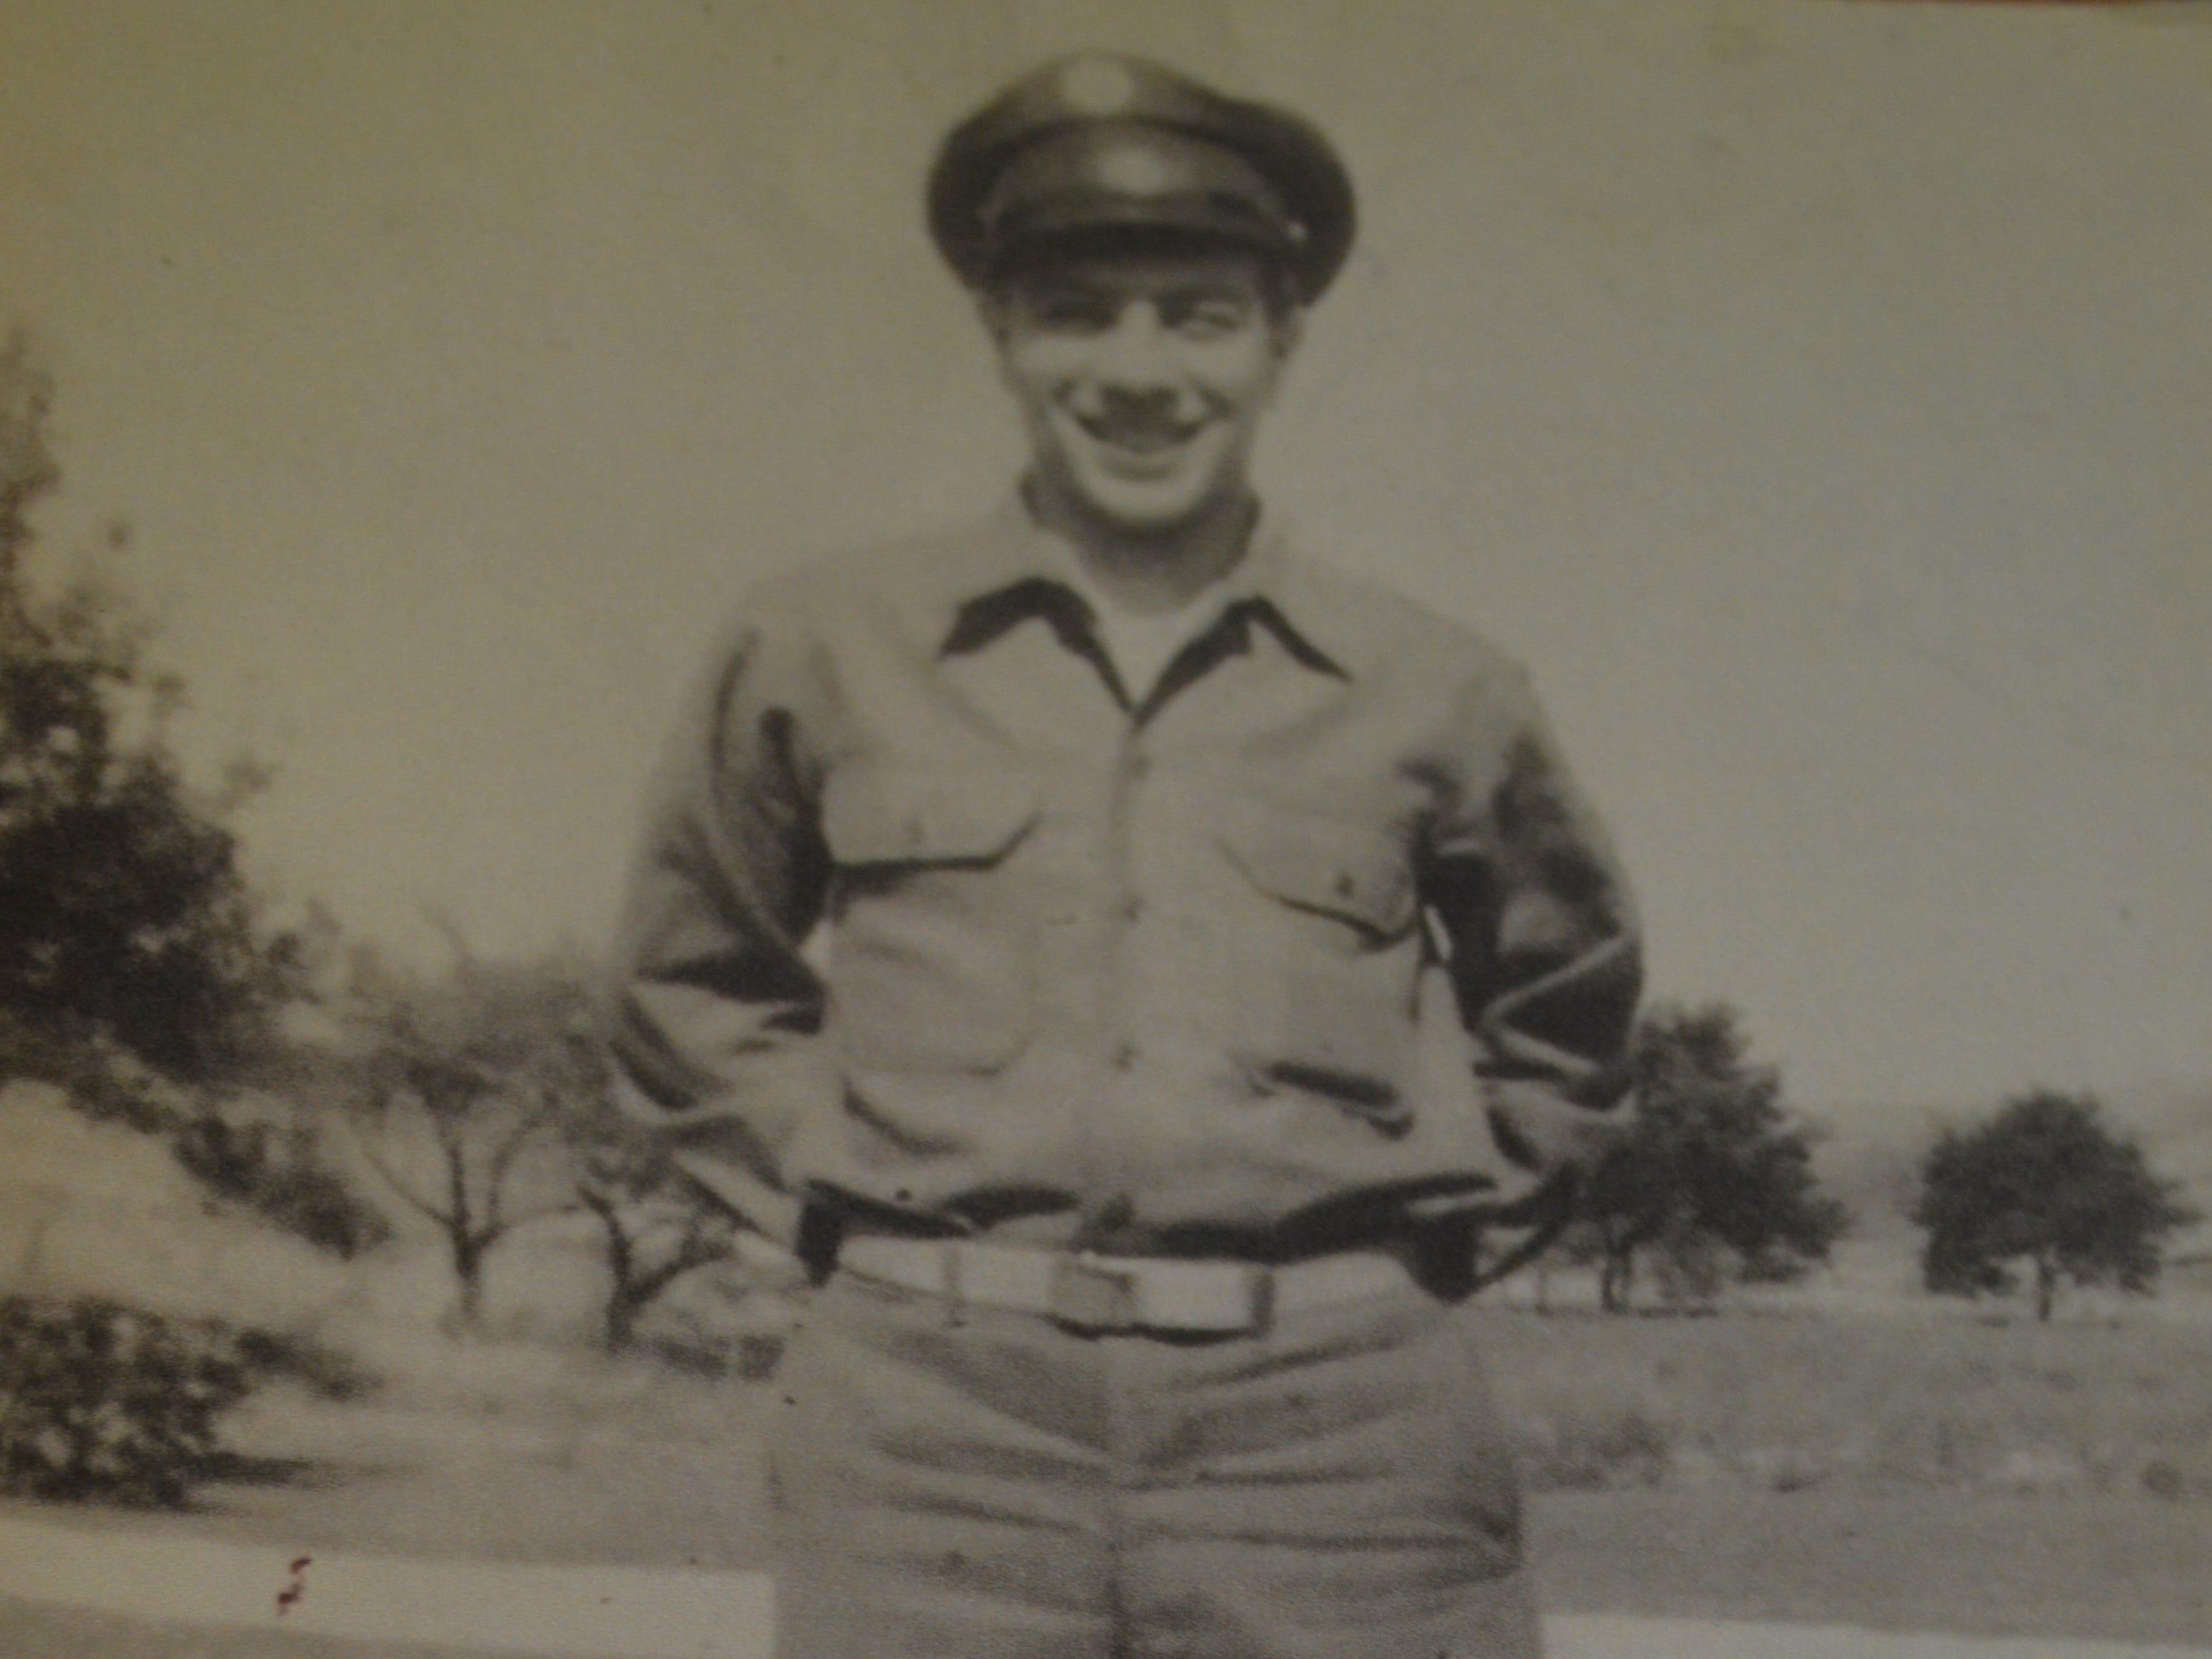 The late Simon Vitale, Karissa Vitale Adam's grandpa, joined the Army when he was 17.